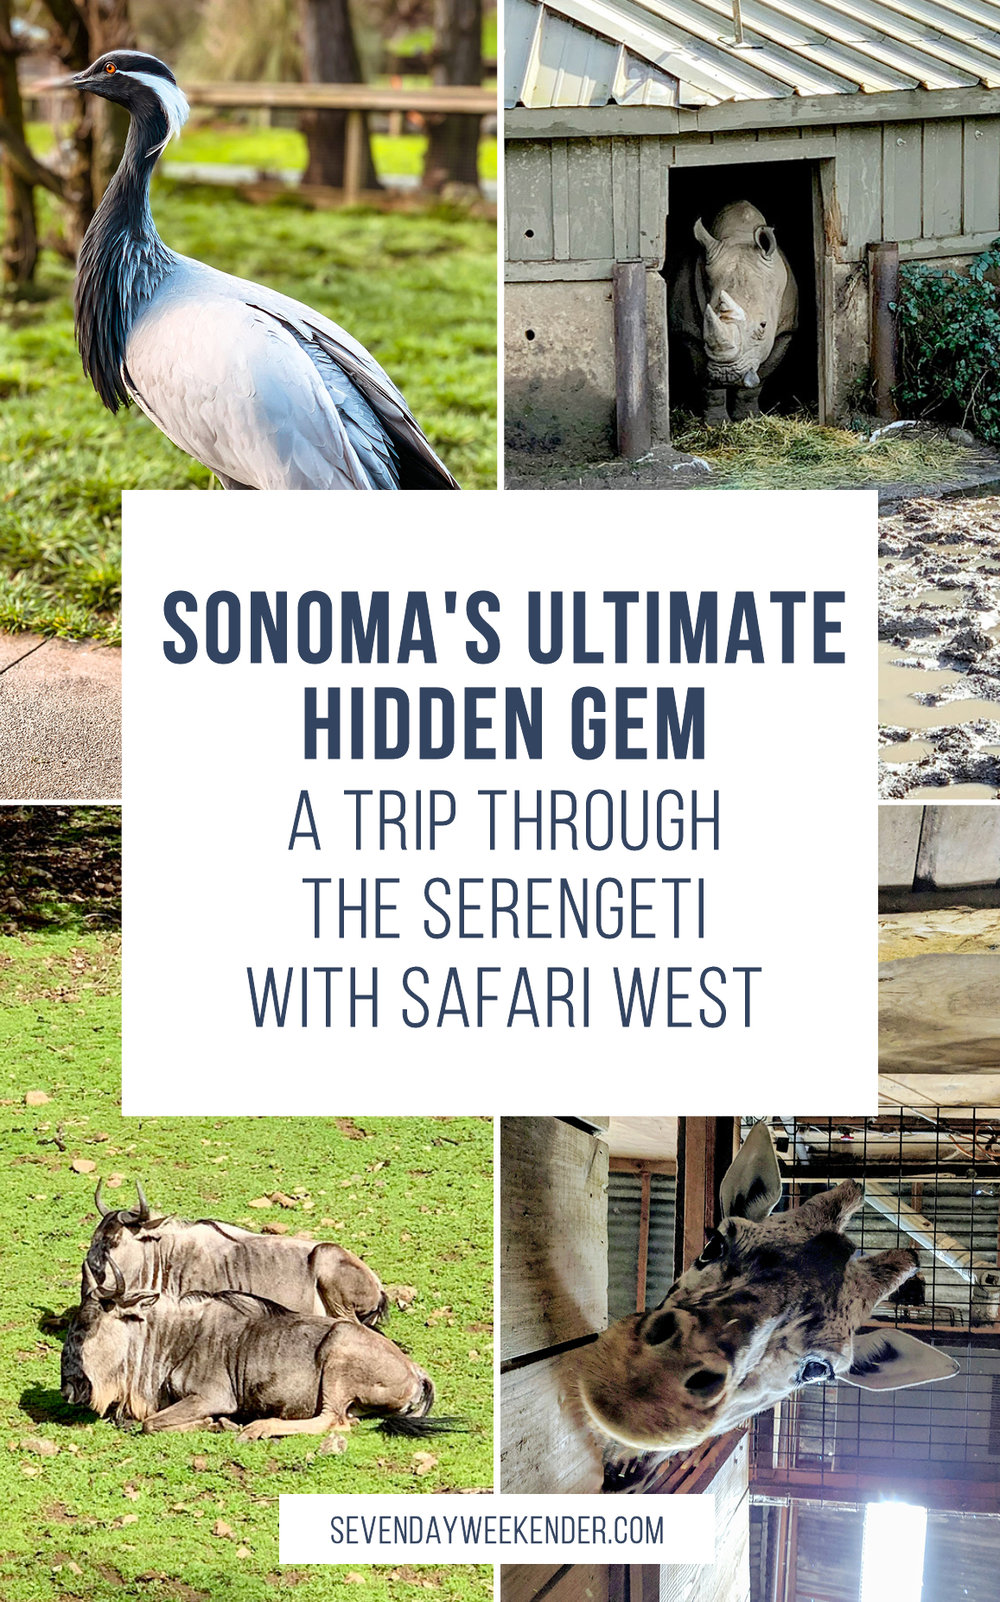 Sonoma's Ultimate Hidden Gem: Safari West